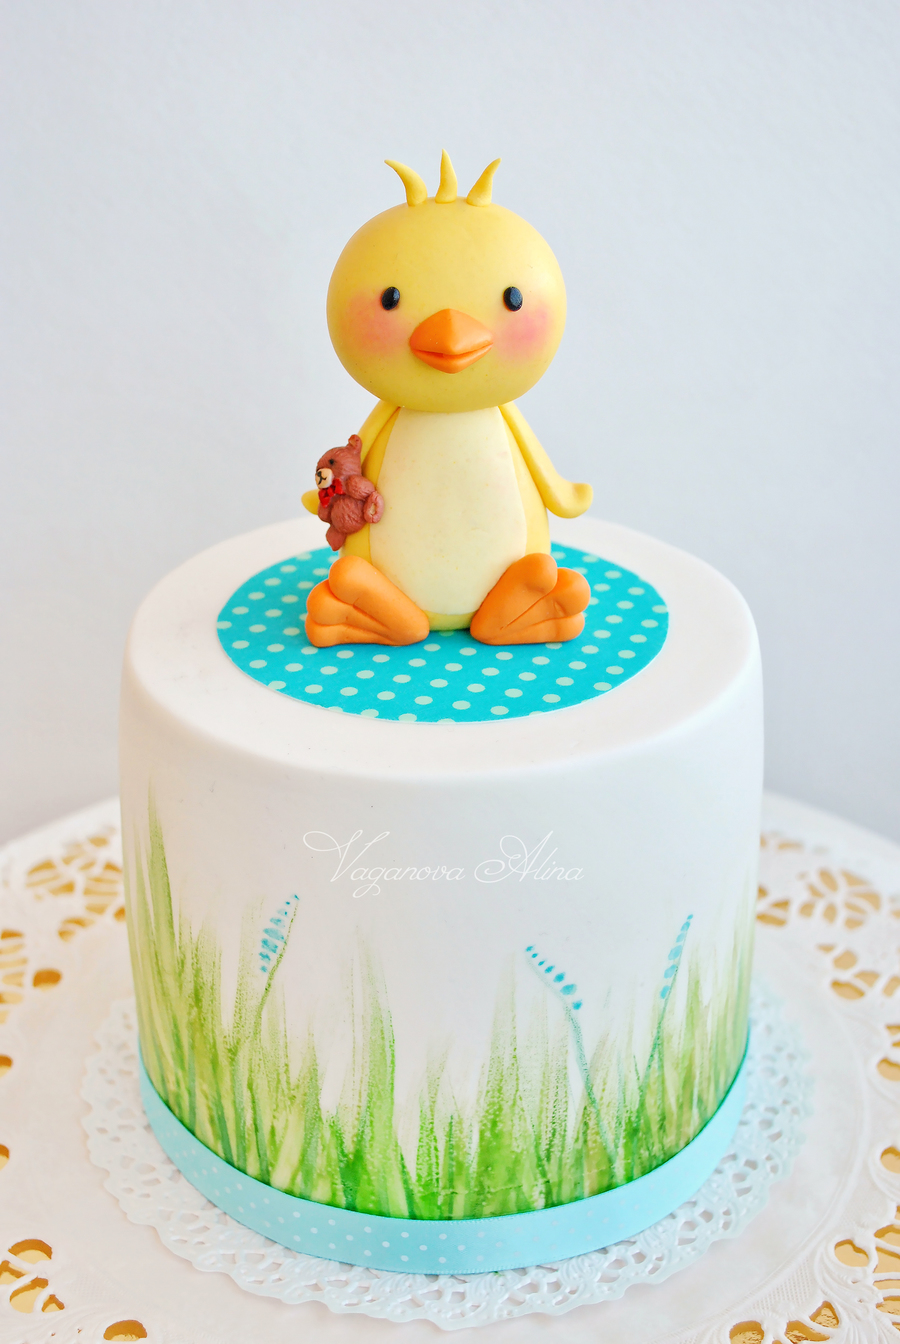 Ducks Birthday Cake Design